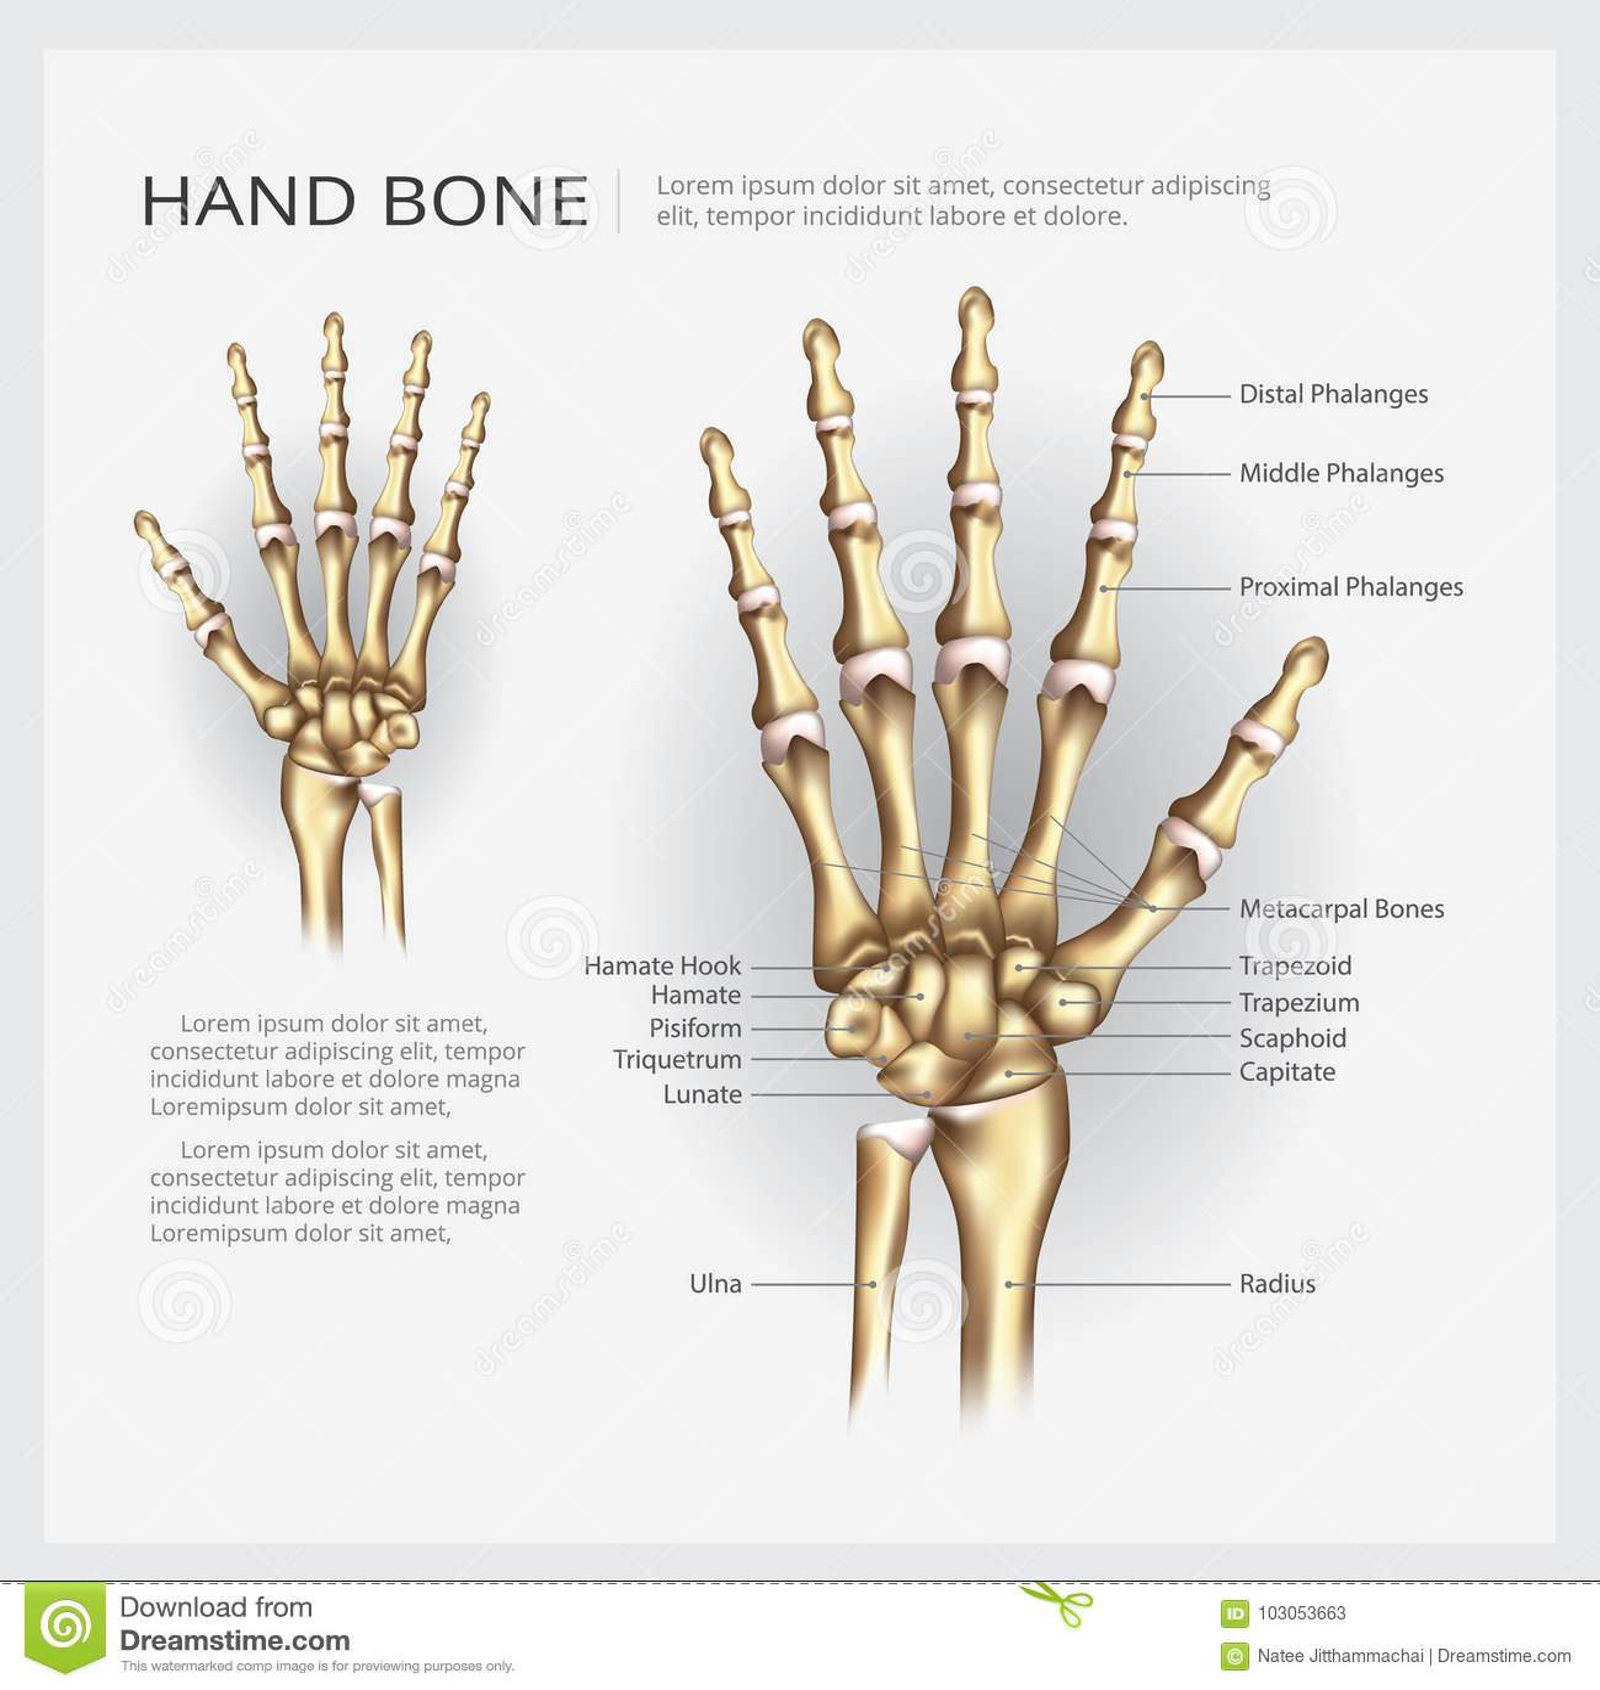 Human Anatomy Hand Bone Stock Vector Illustration Of Bone 103053663